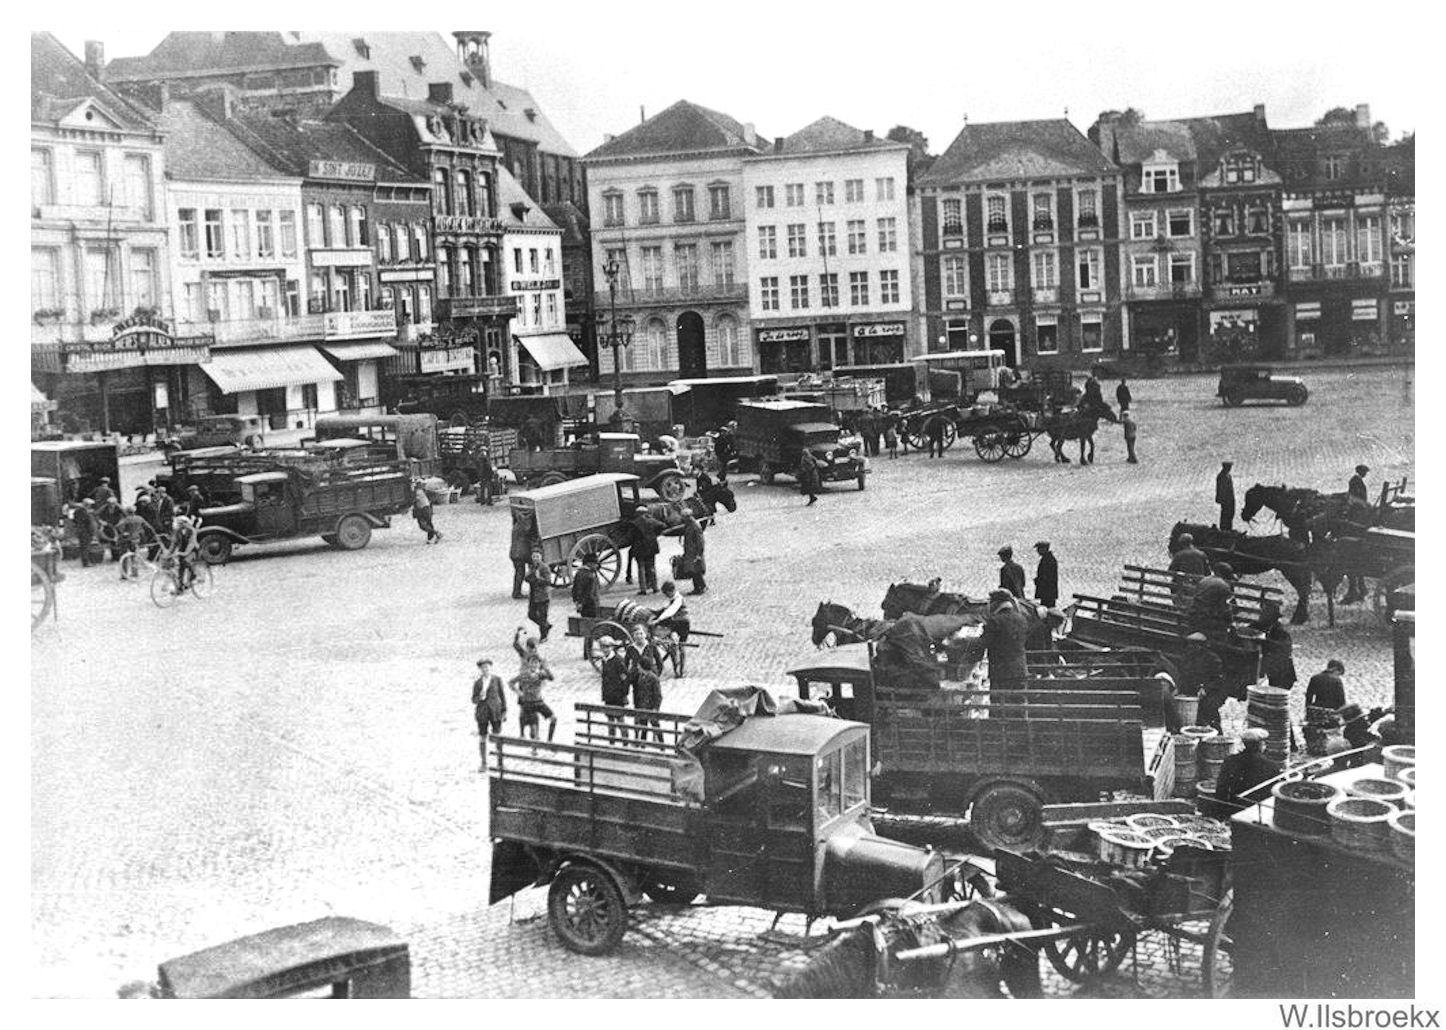 P:\Fotocollectie Ilsbroekx\Verzameling W.Ilsbroekx\Grote Markt\Grote Markt 20.jpg